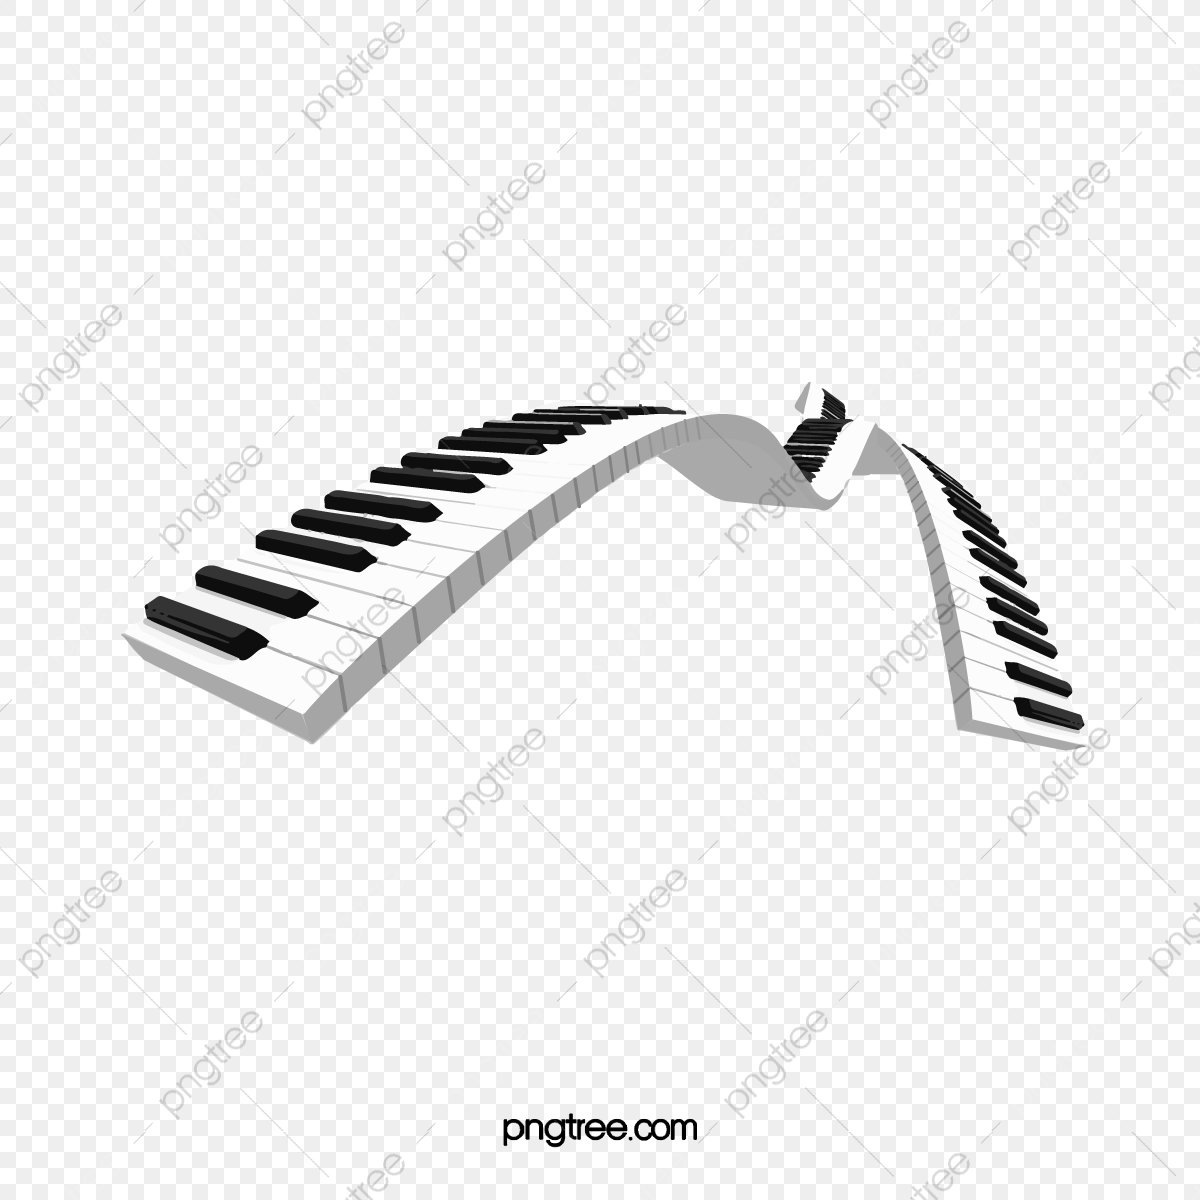 Pintado A Mano De Teclas De Piano Botón Teclado Teclado